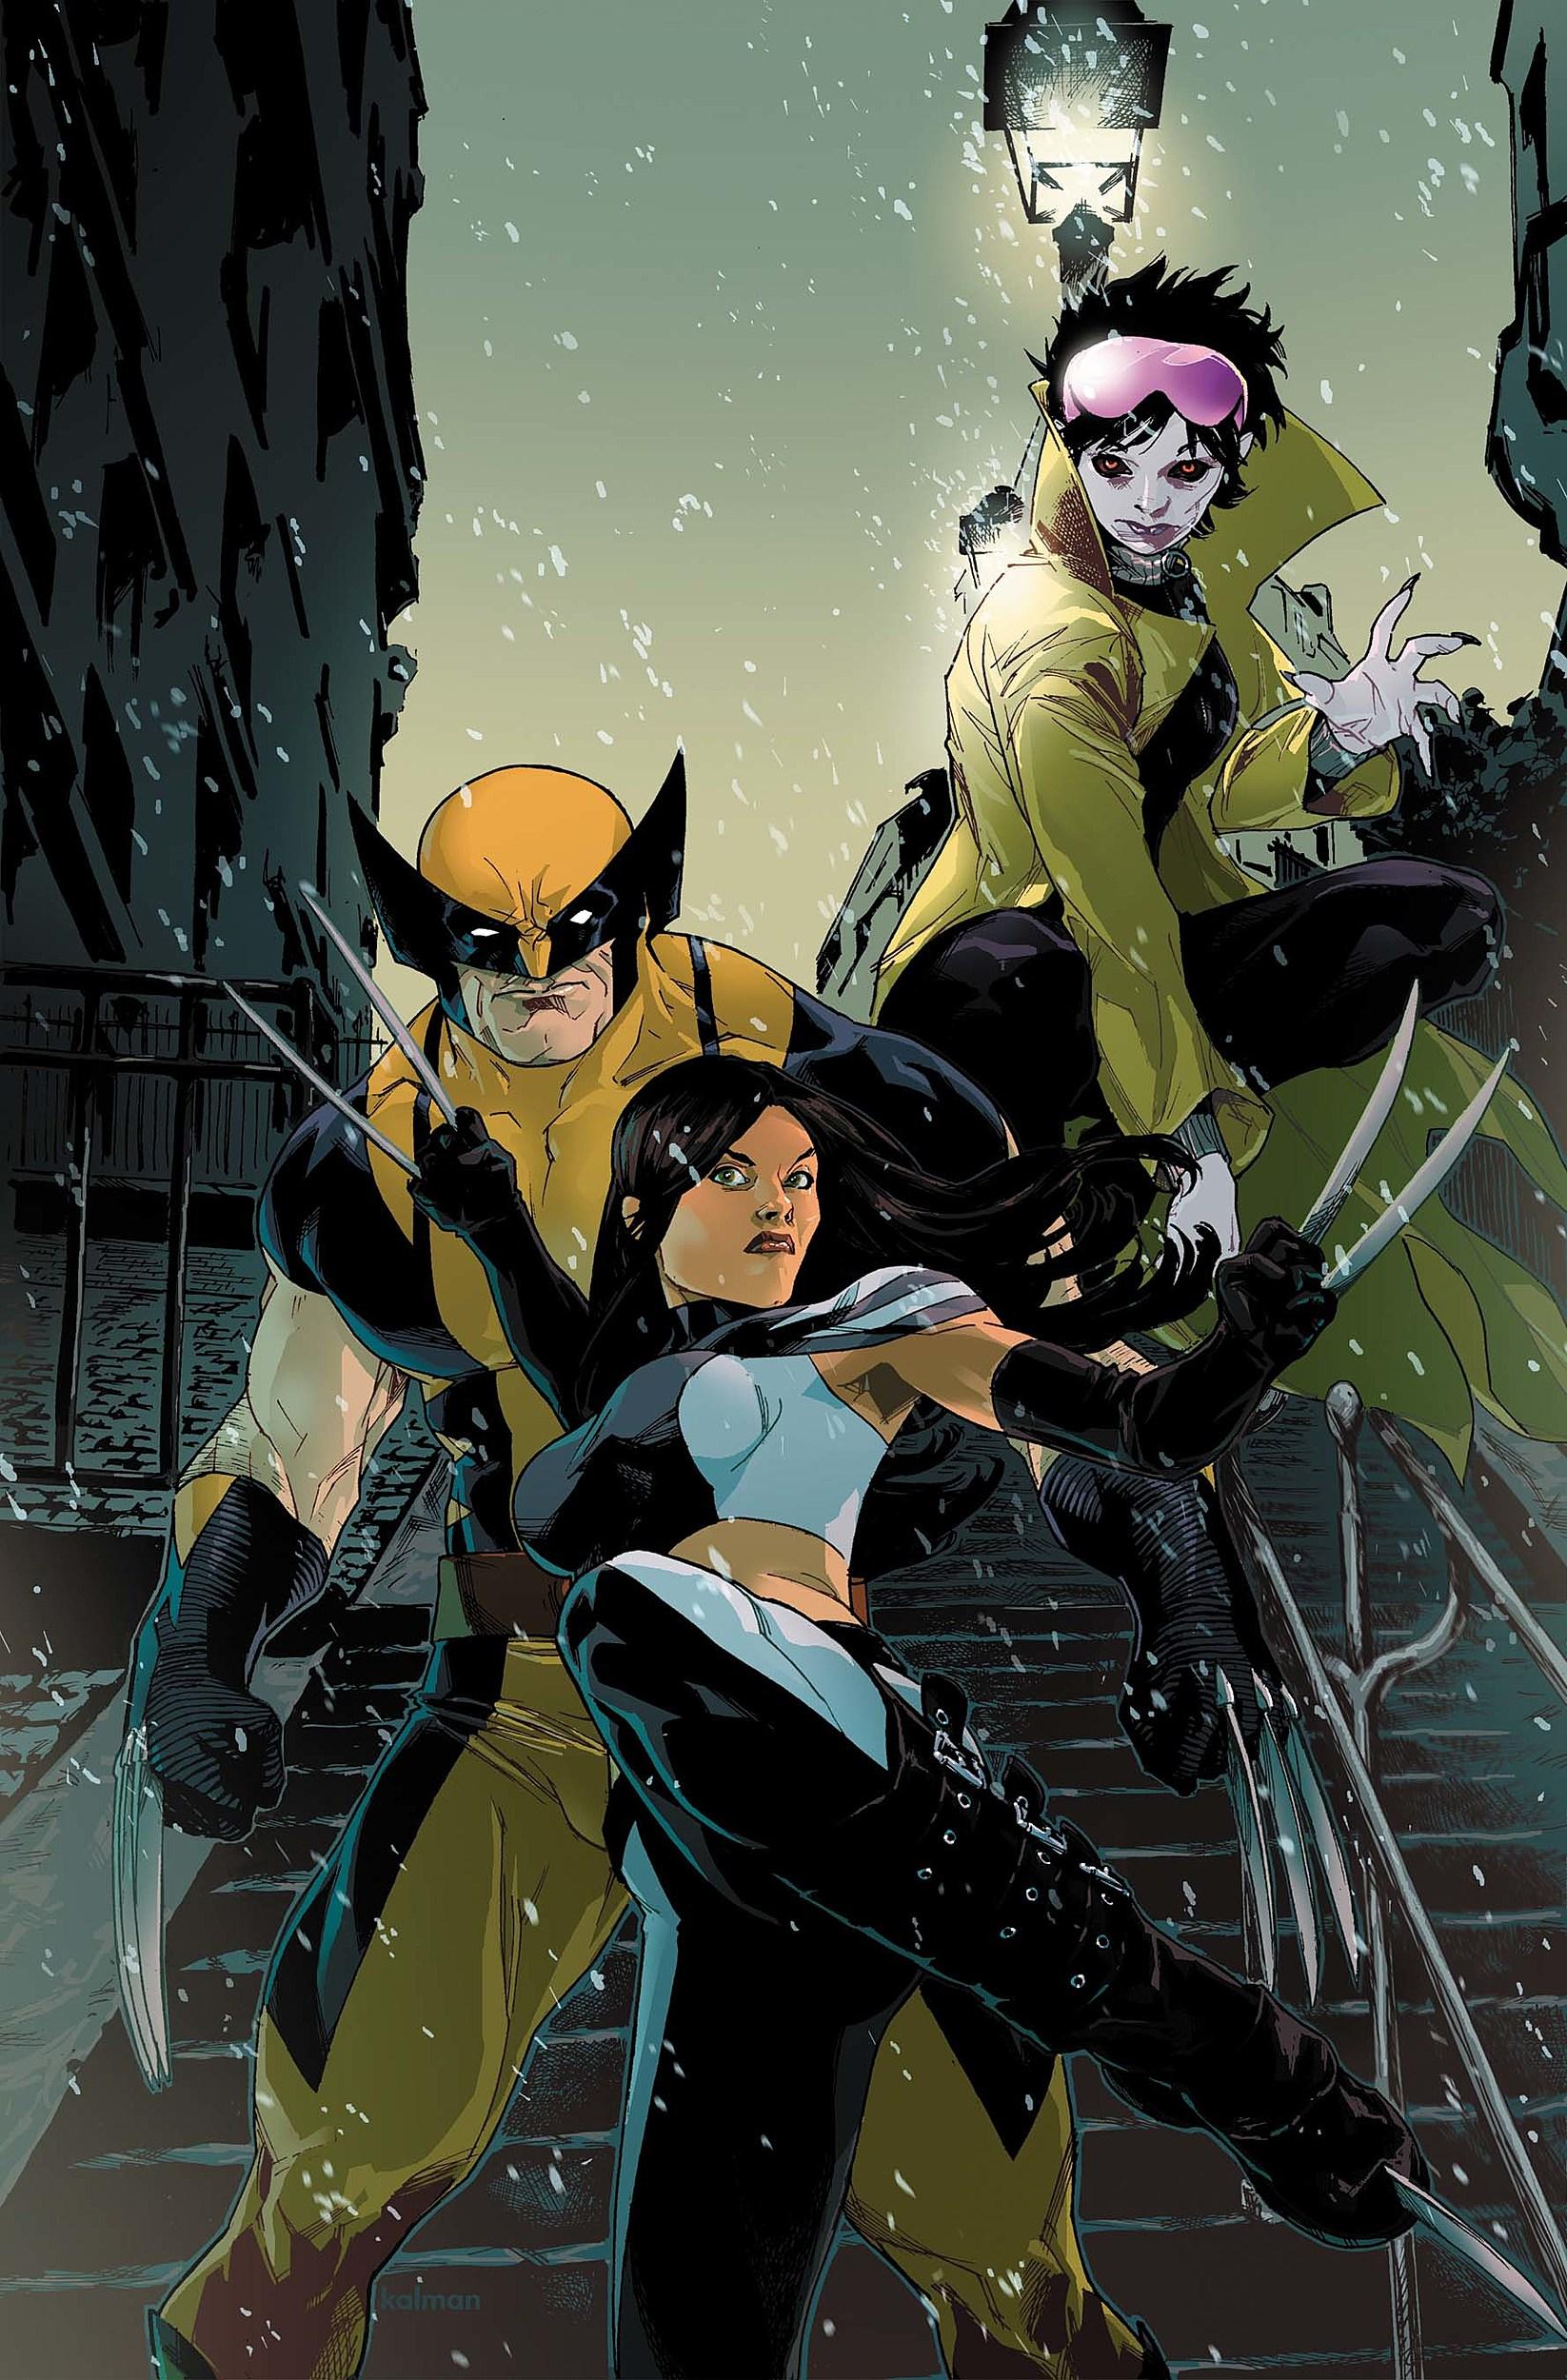 The Top 10 Marvel Comics Coming in June 2011